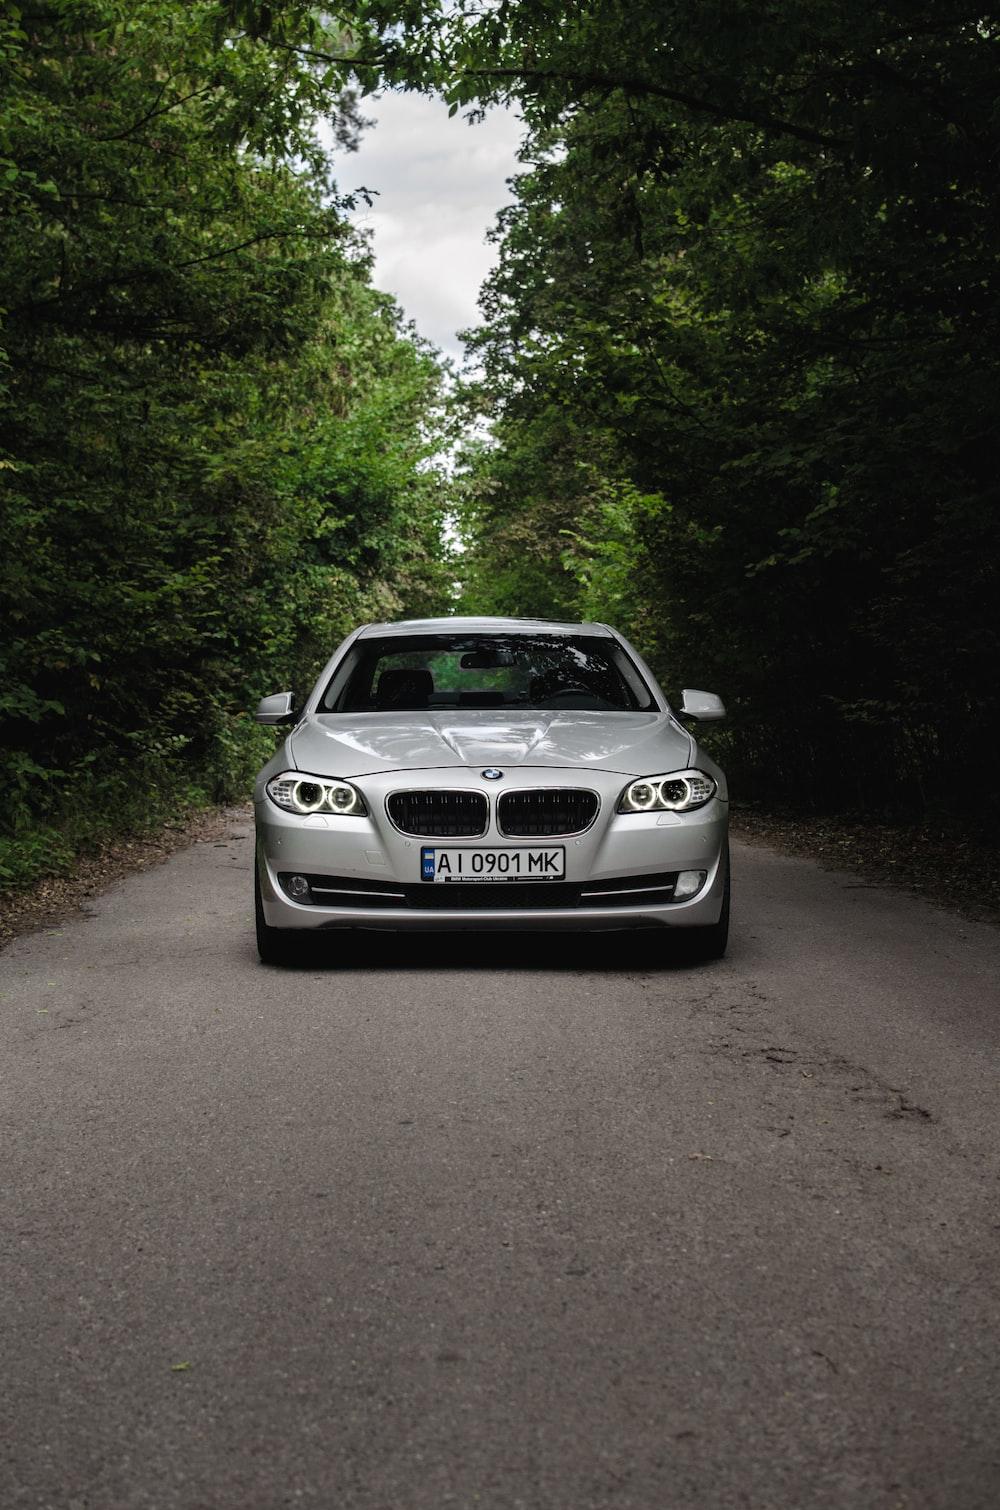 silver bmw m 3 on road